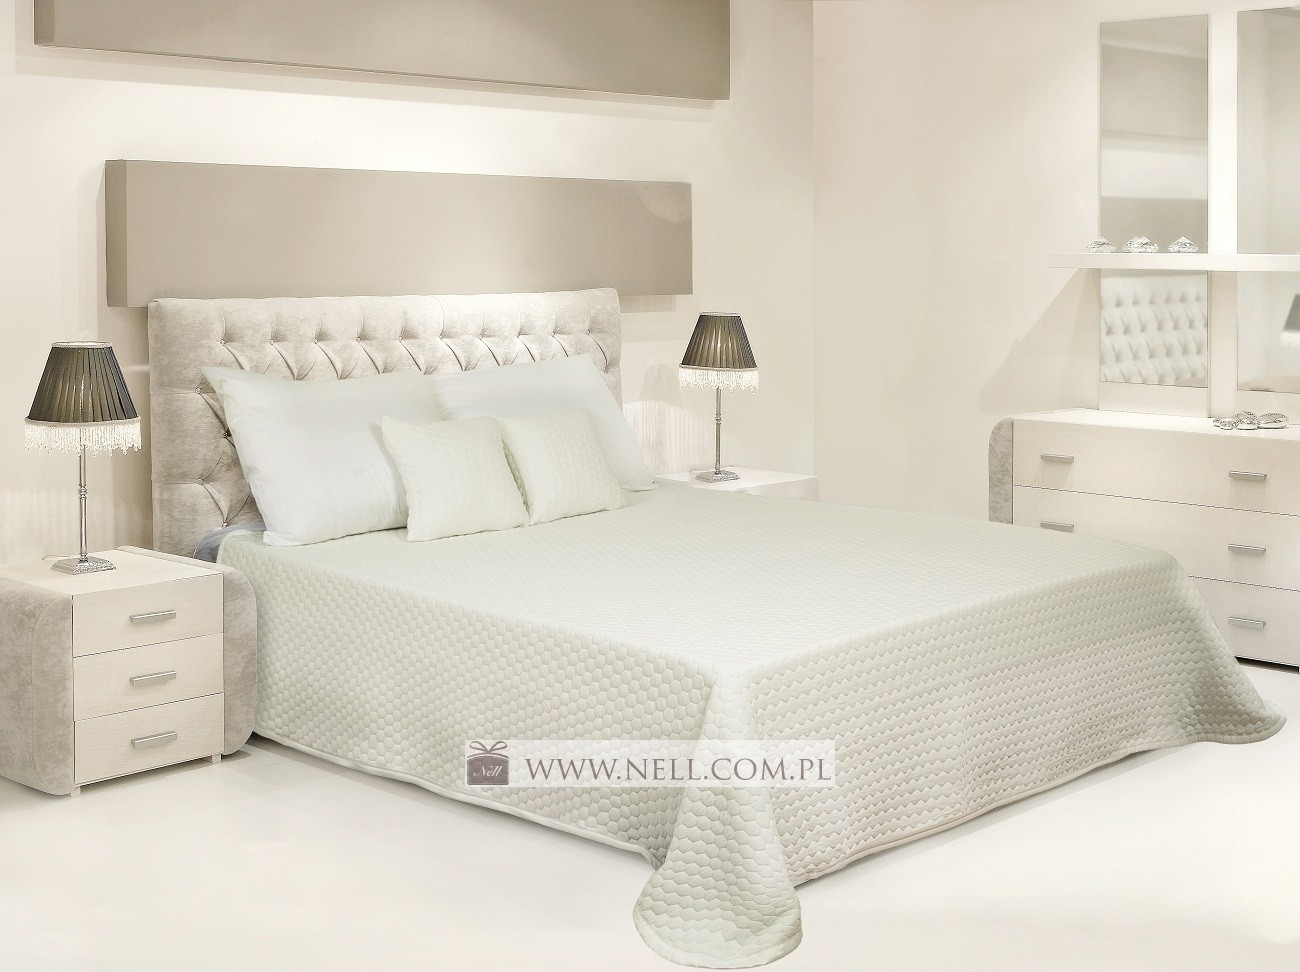 Narzuta Na łóżko Capri Cappuccino